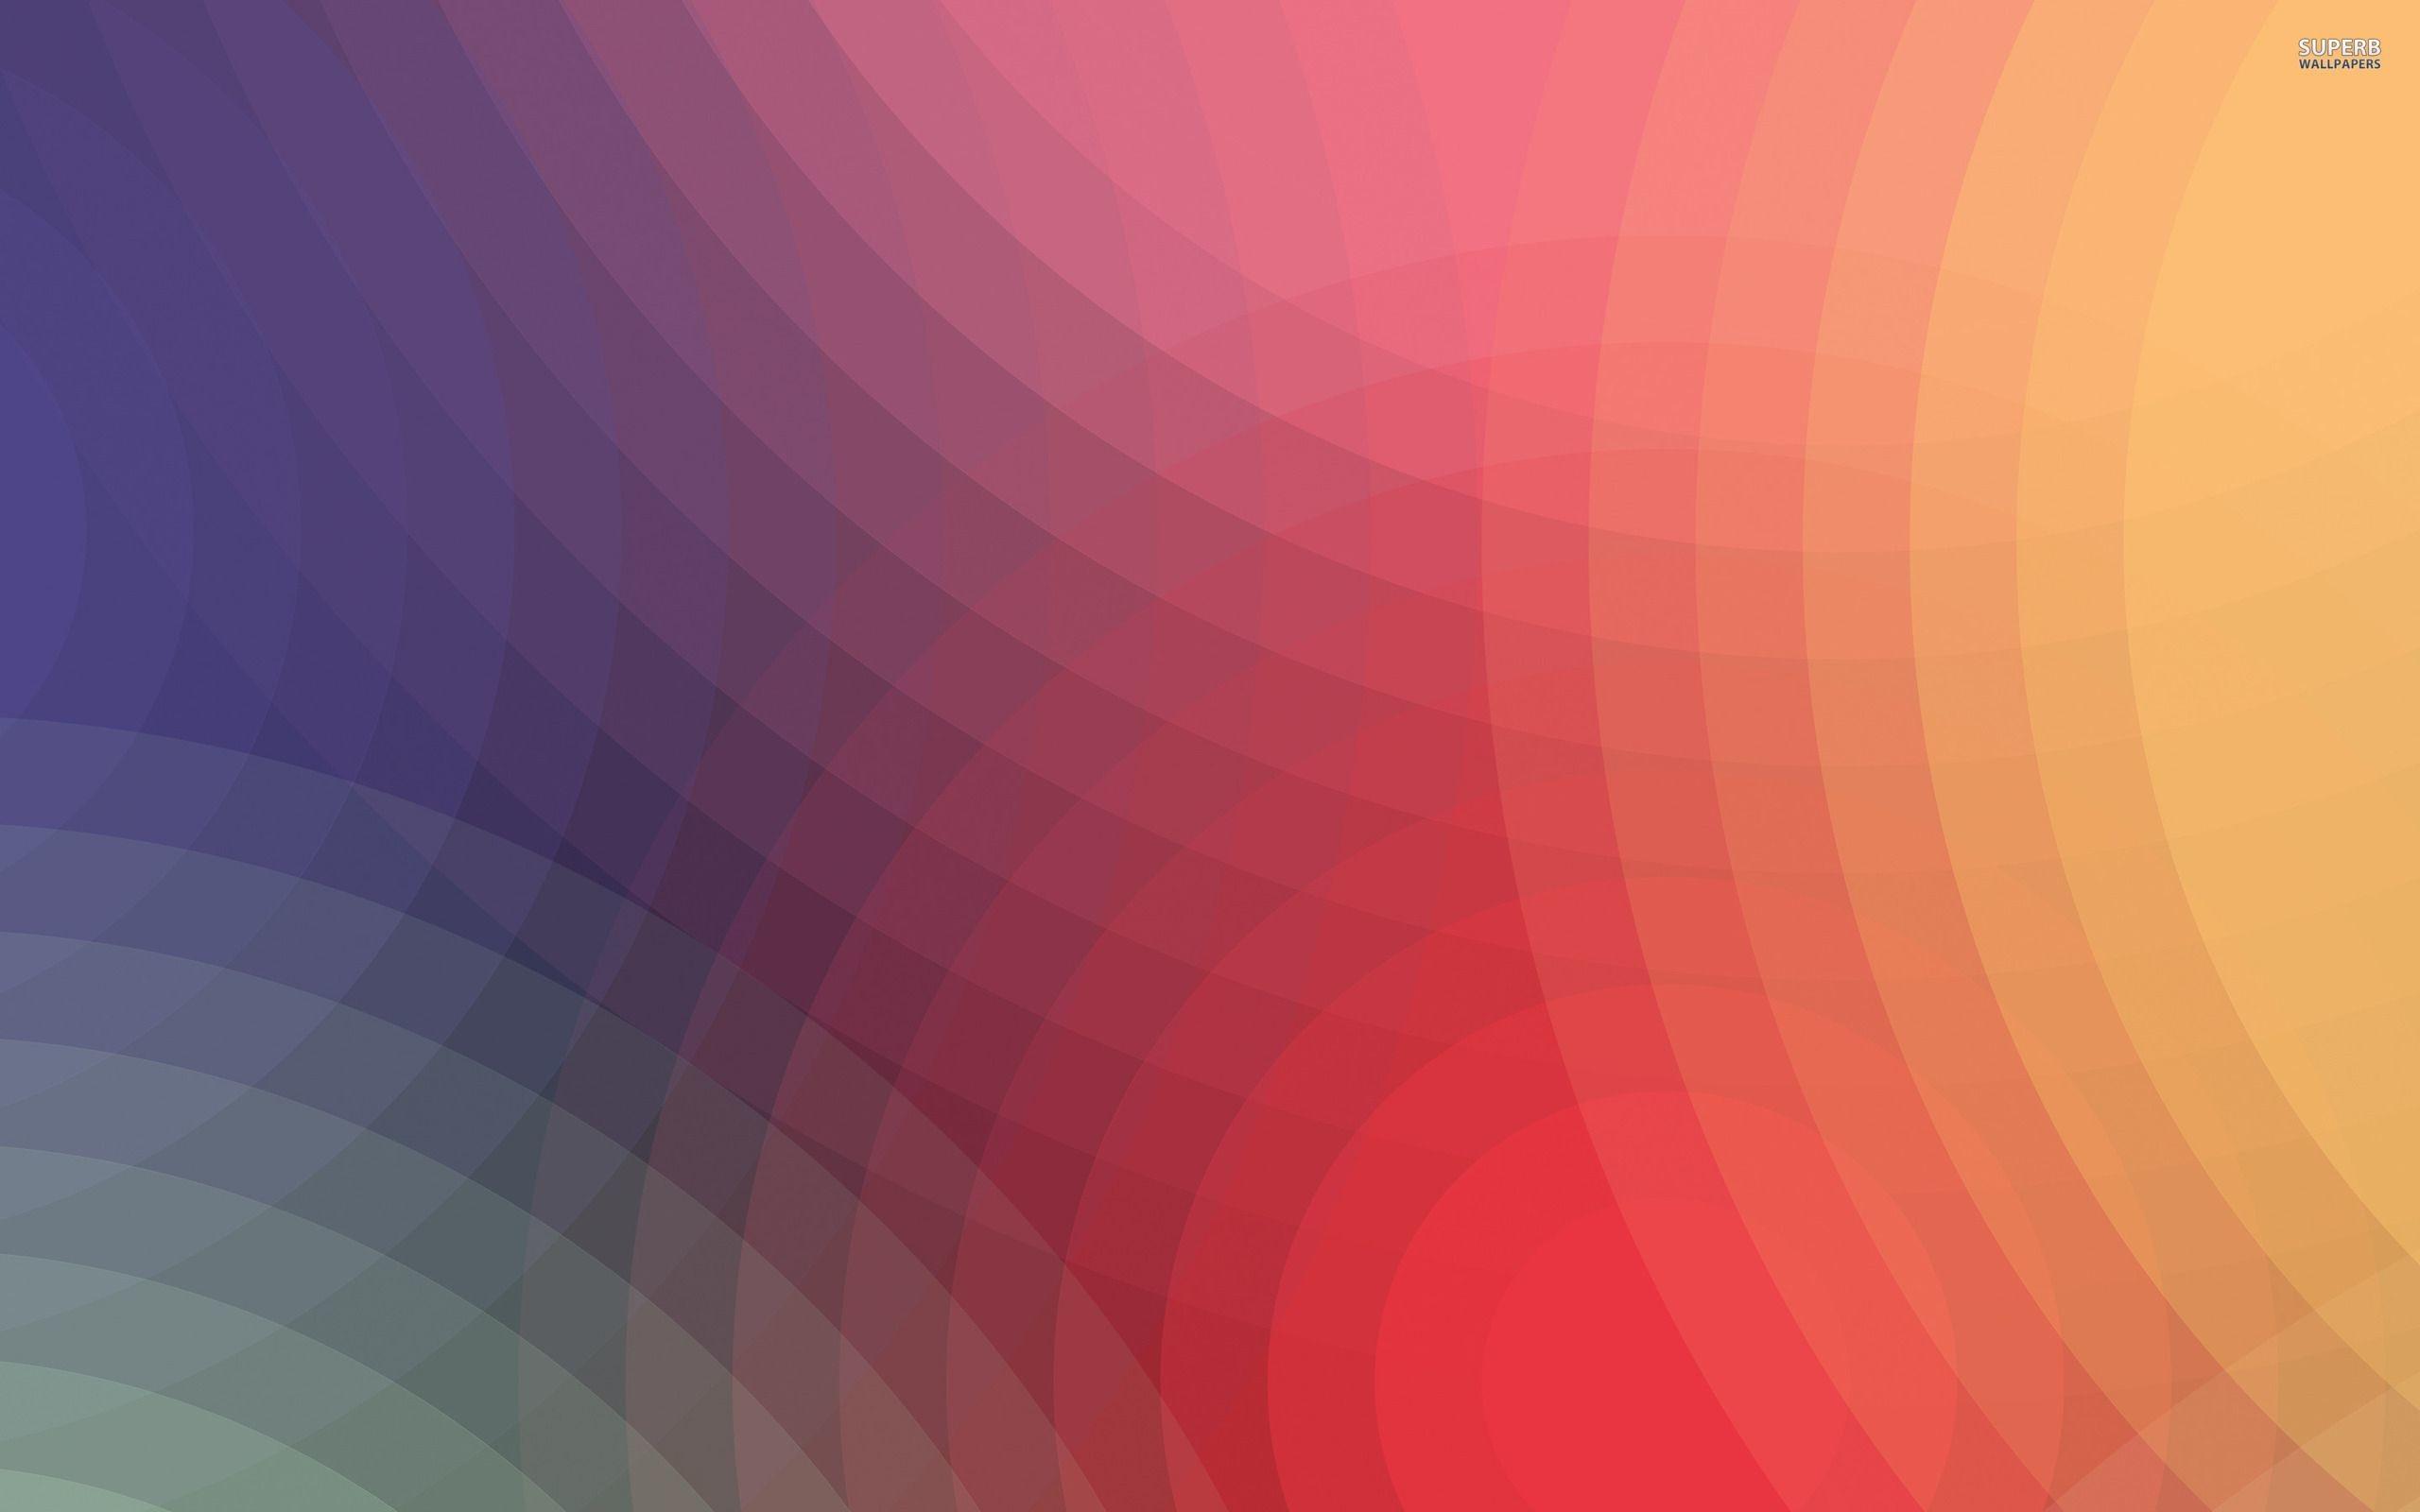 Rainbow colored circles wallpaper – Abstract wallpapers – #17720